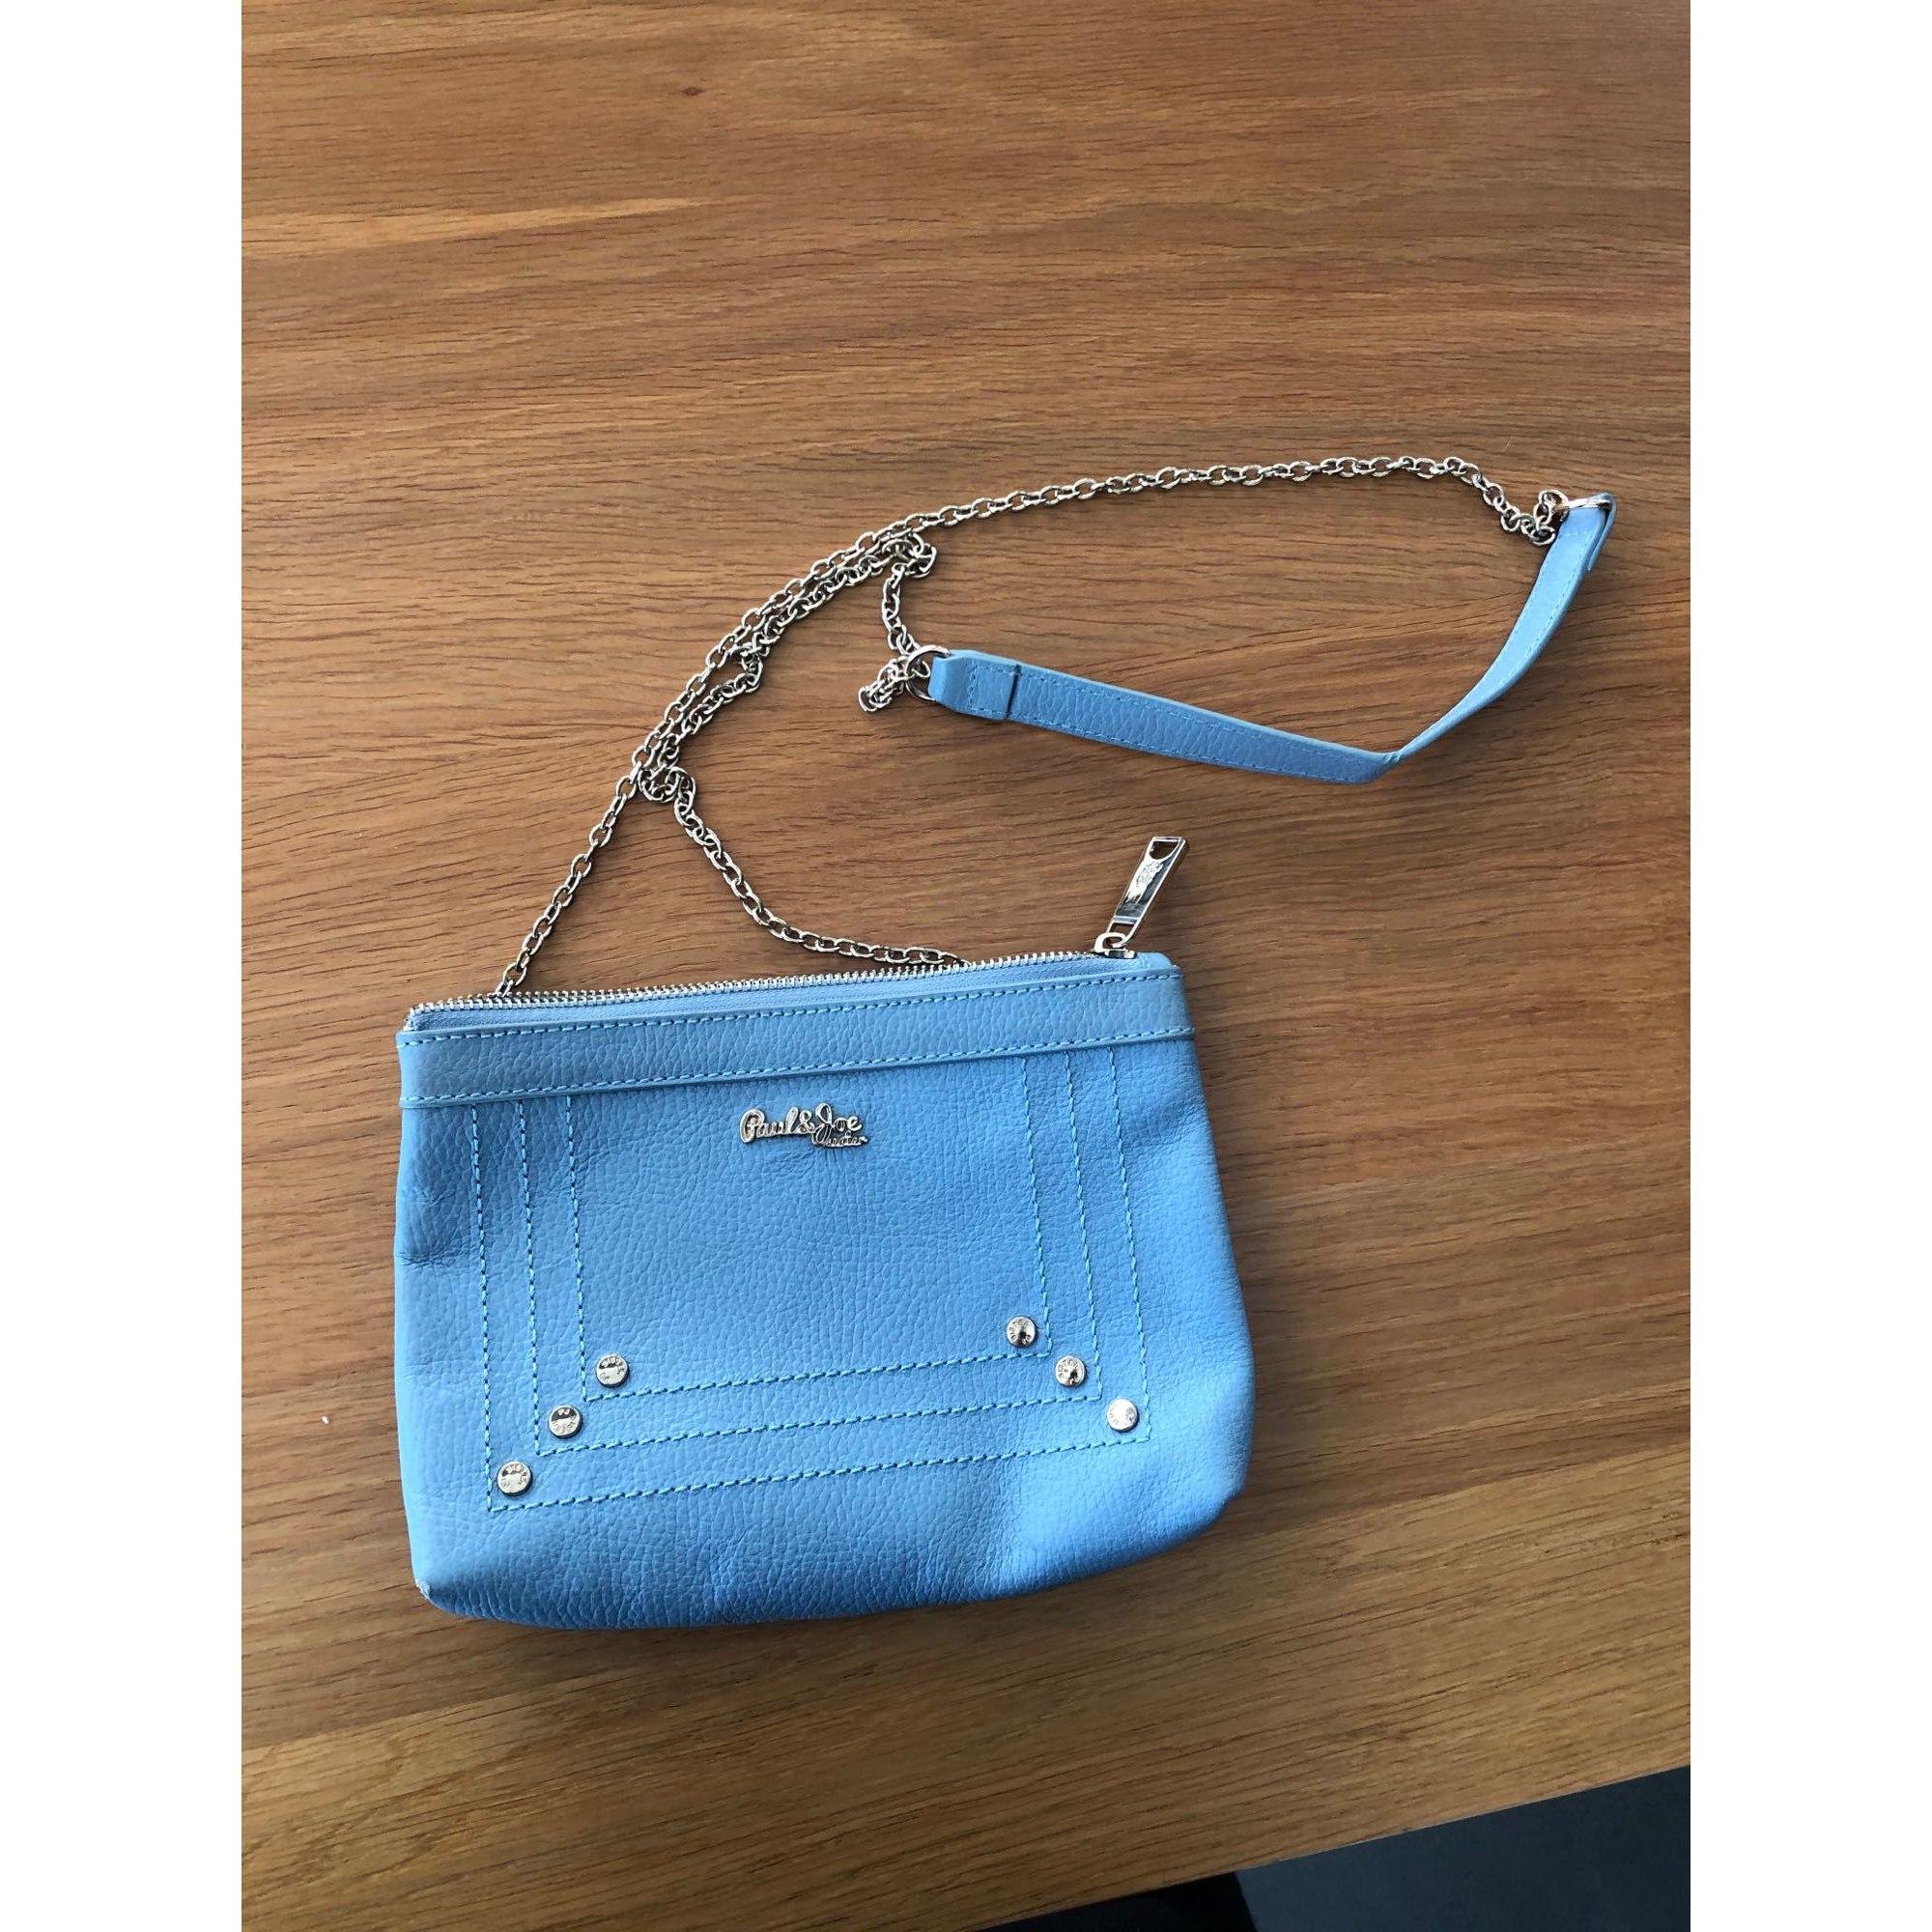 Sac pochette en cuir PAUL & JOE SISTER Bleu, bleu marine, bleu turquoise